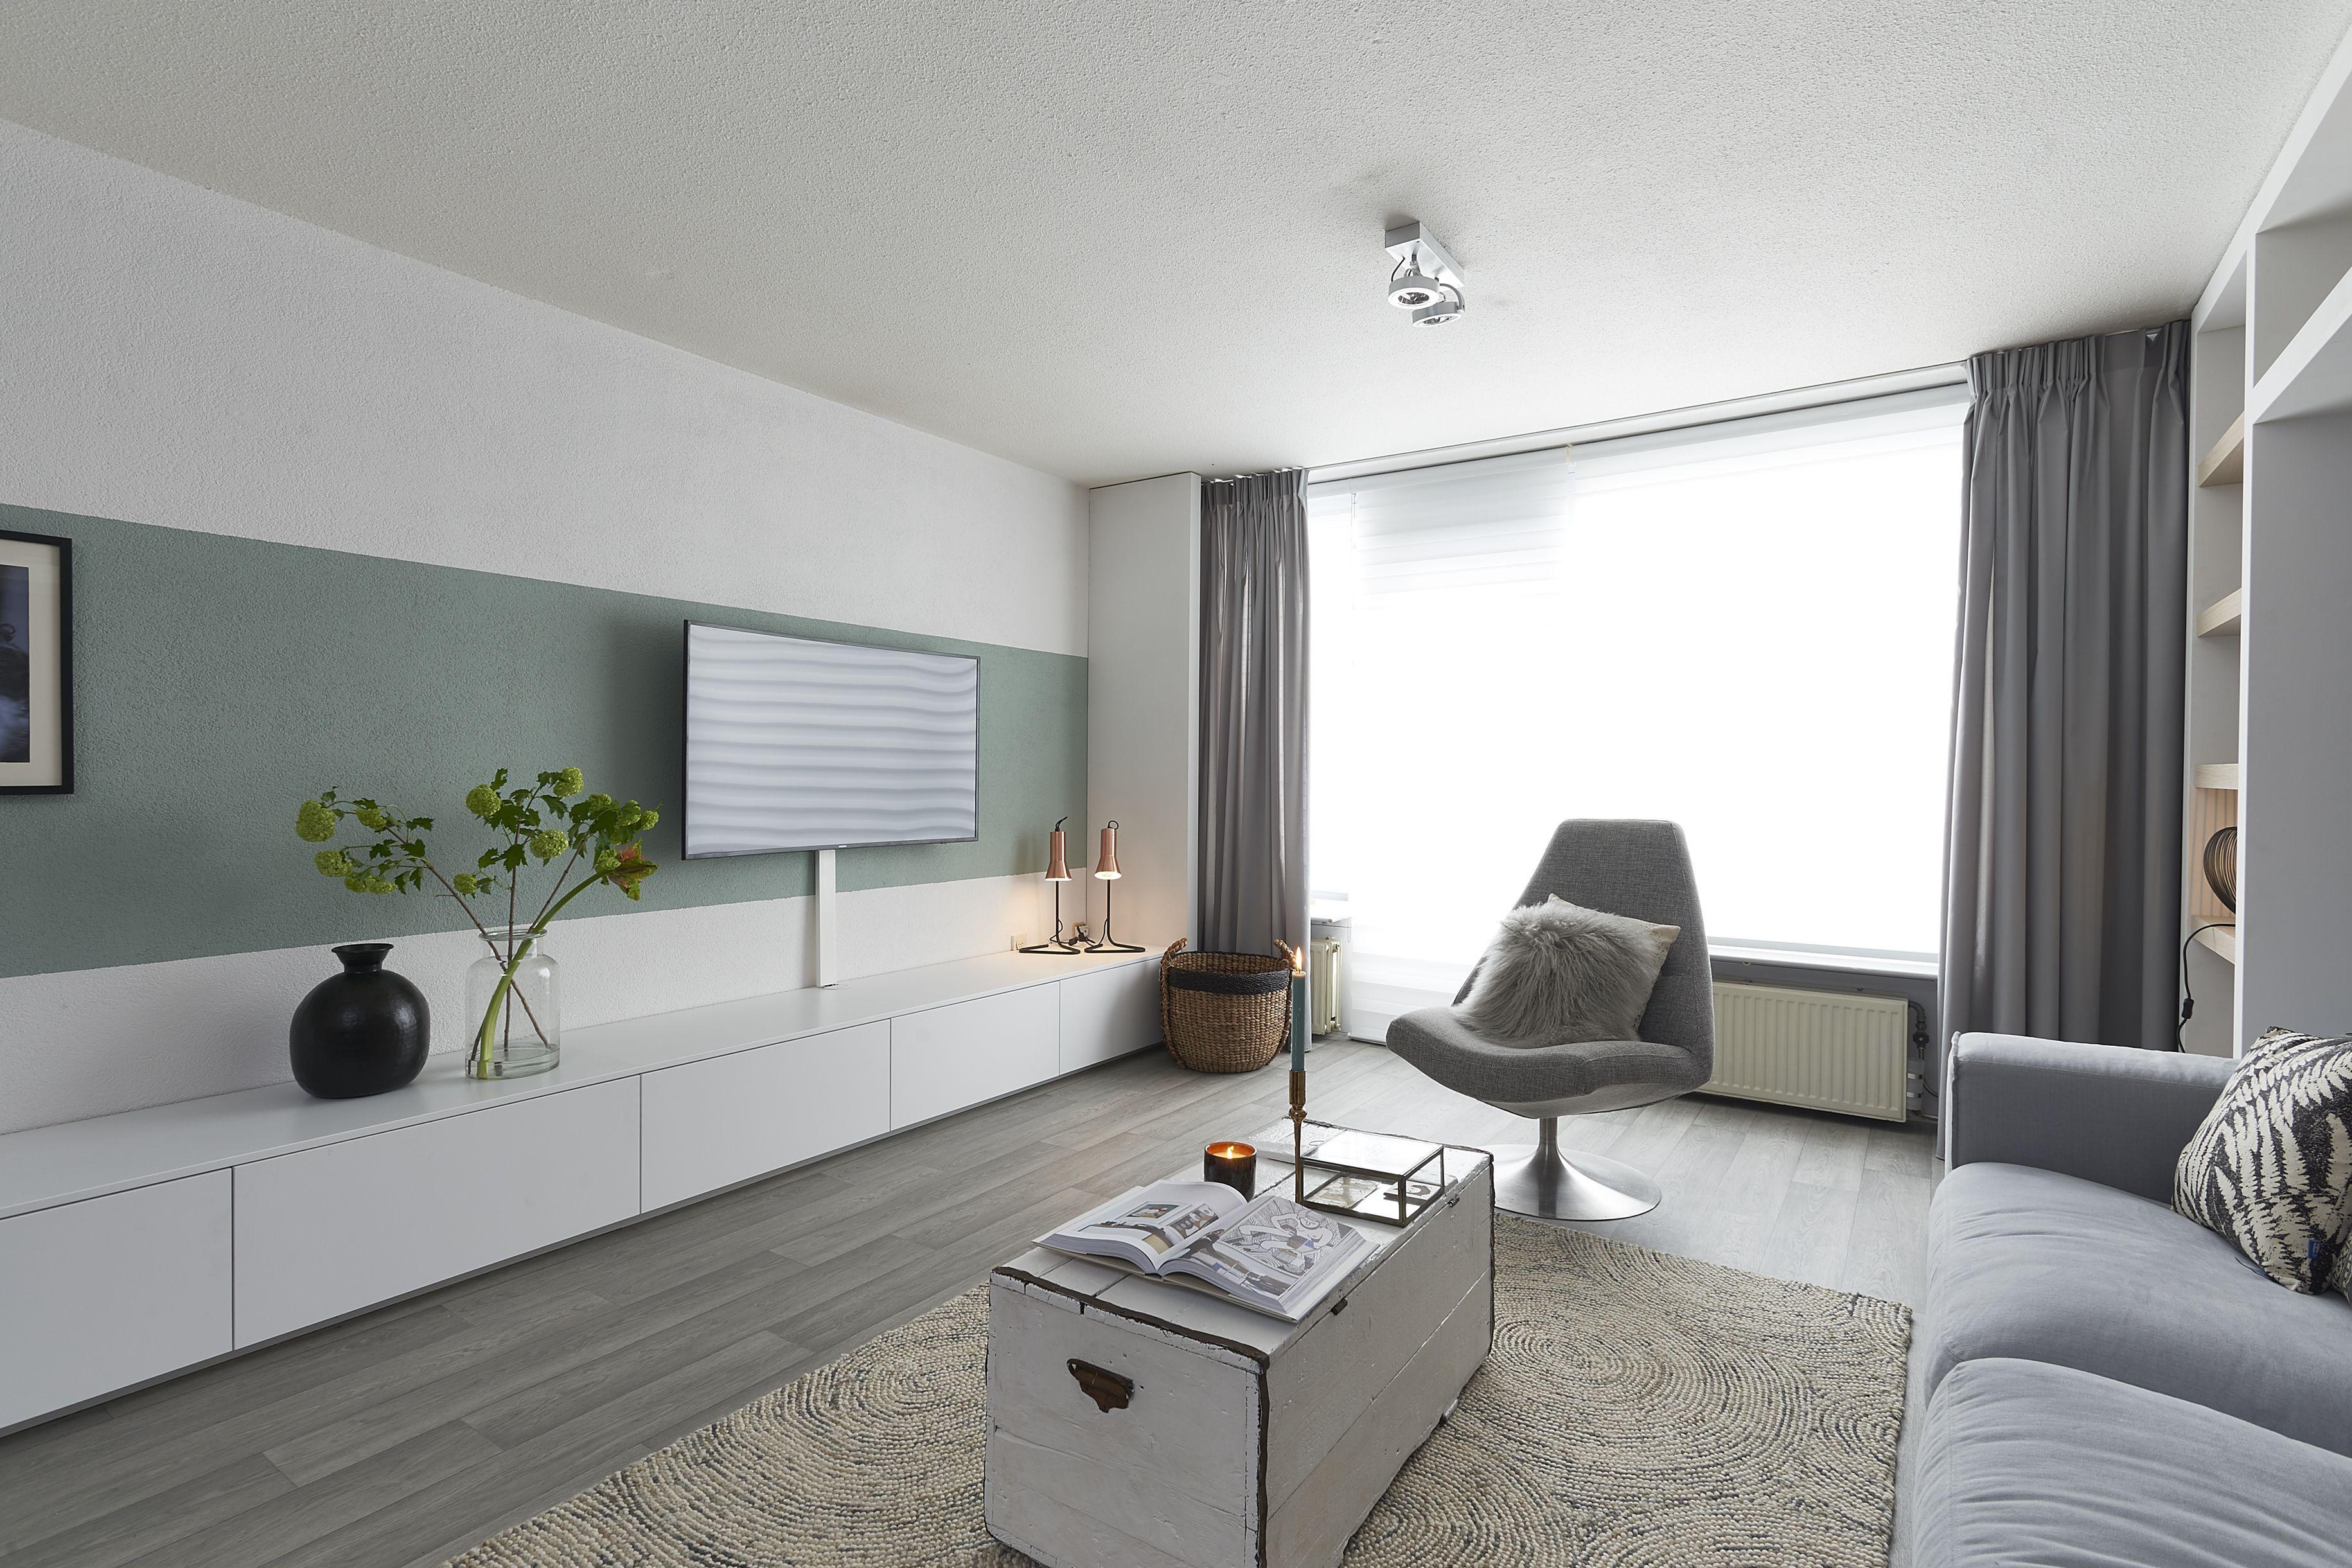 Pin van renate kroes op huis in 2019 pinterest home interior